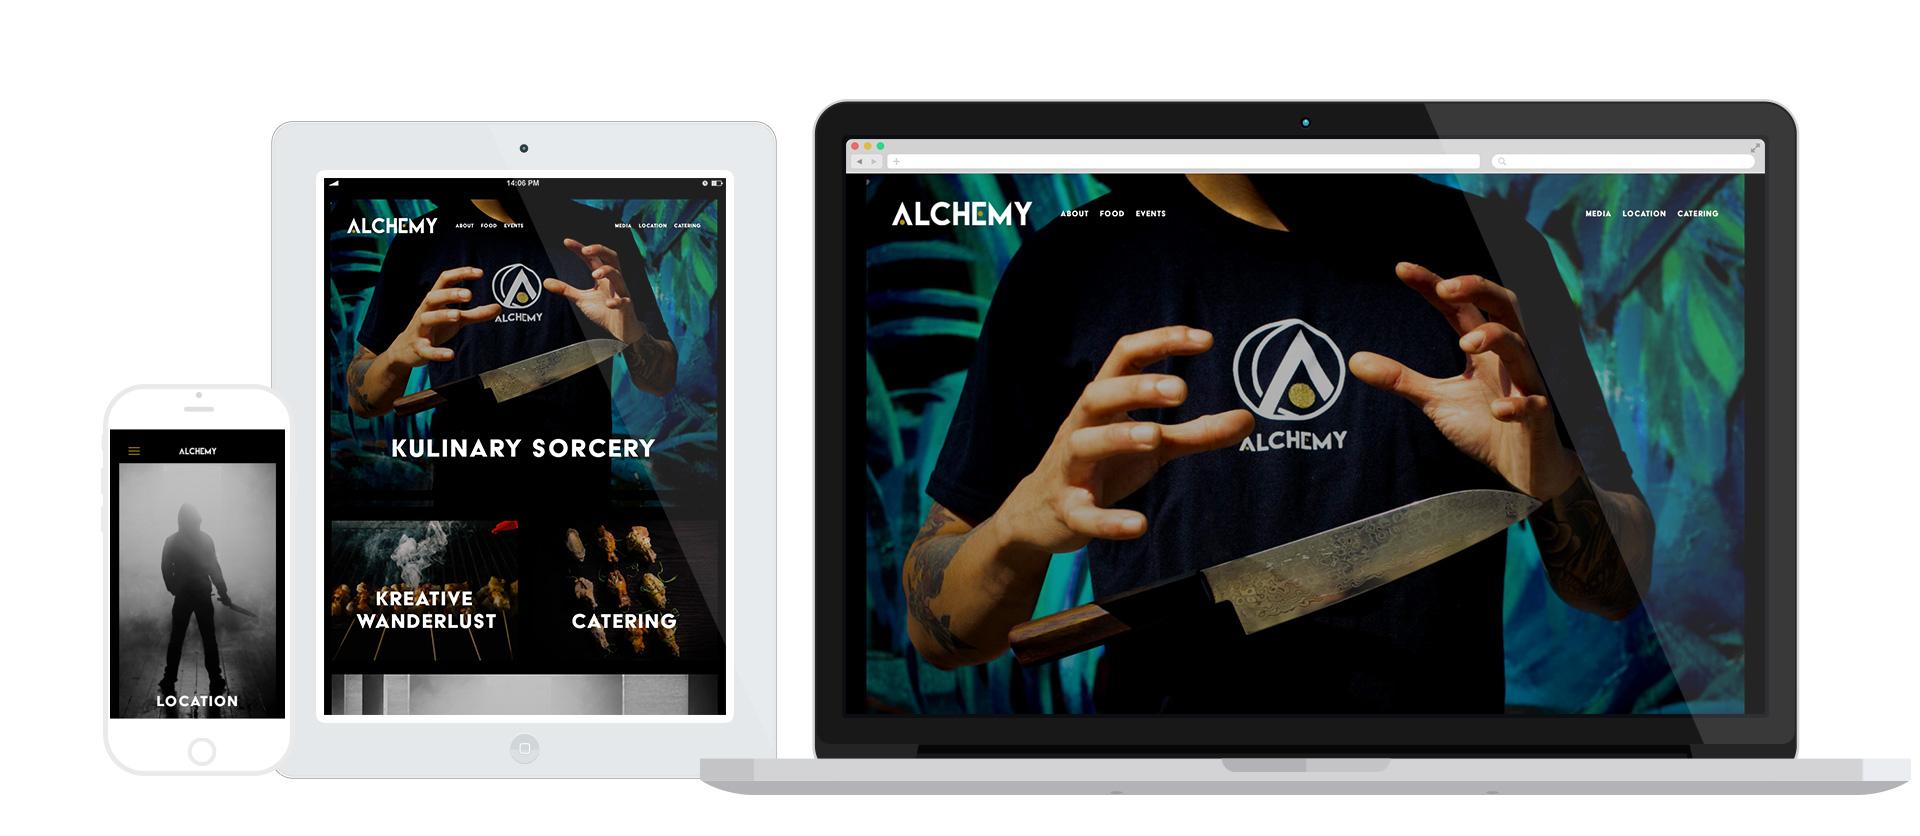 ALCHEMY-new-website-0.jpg